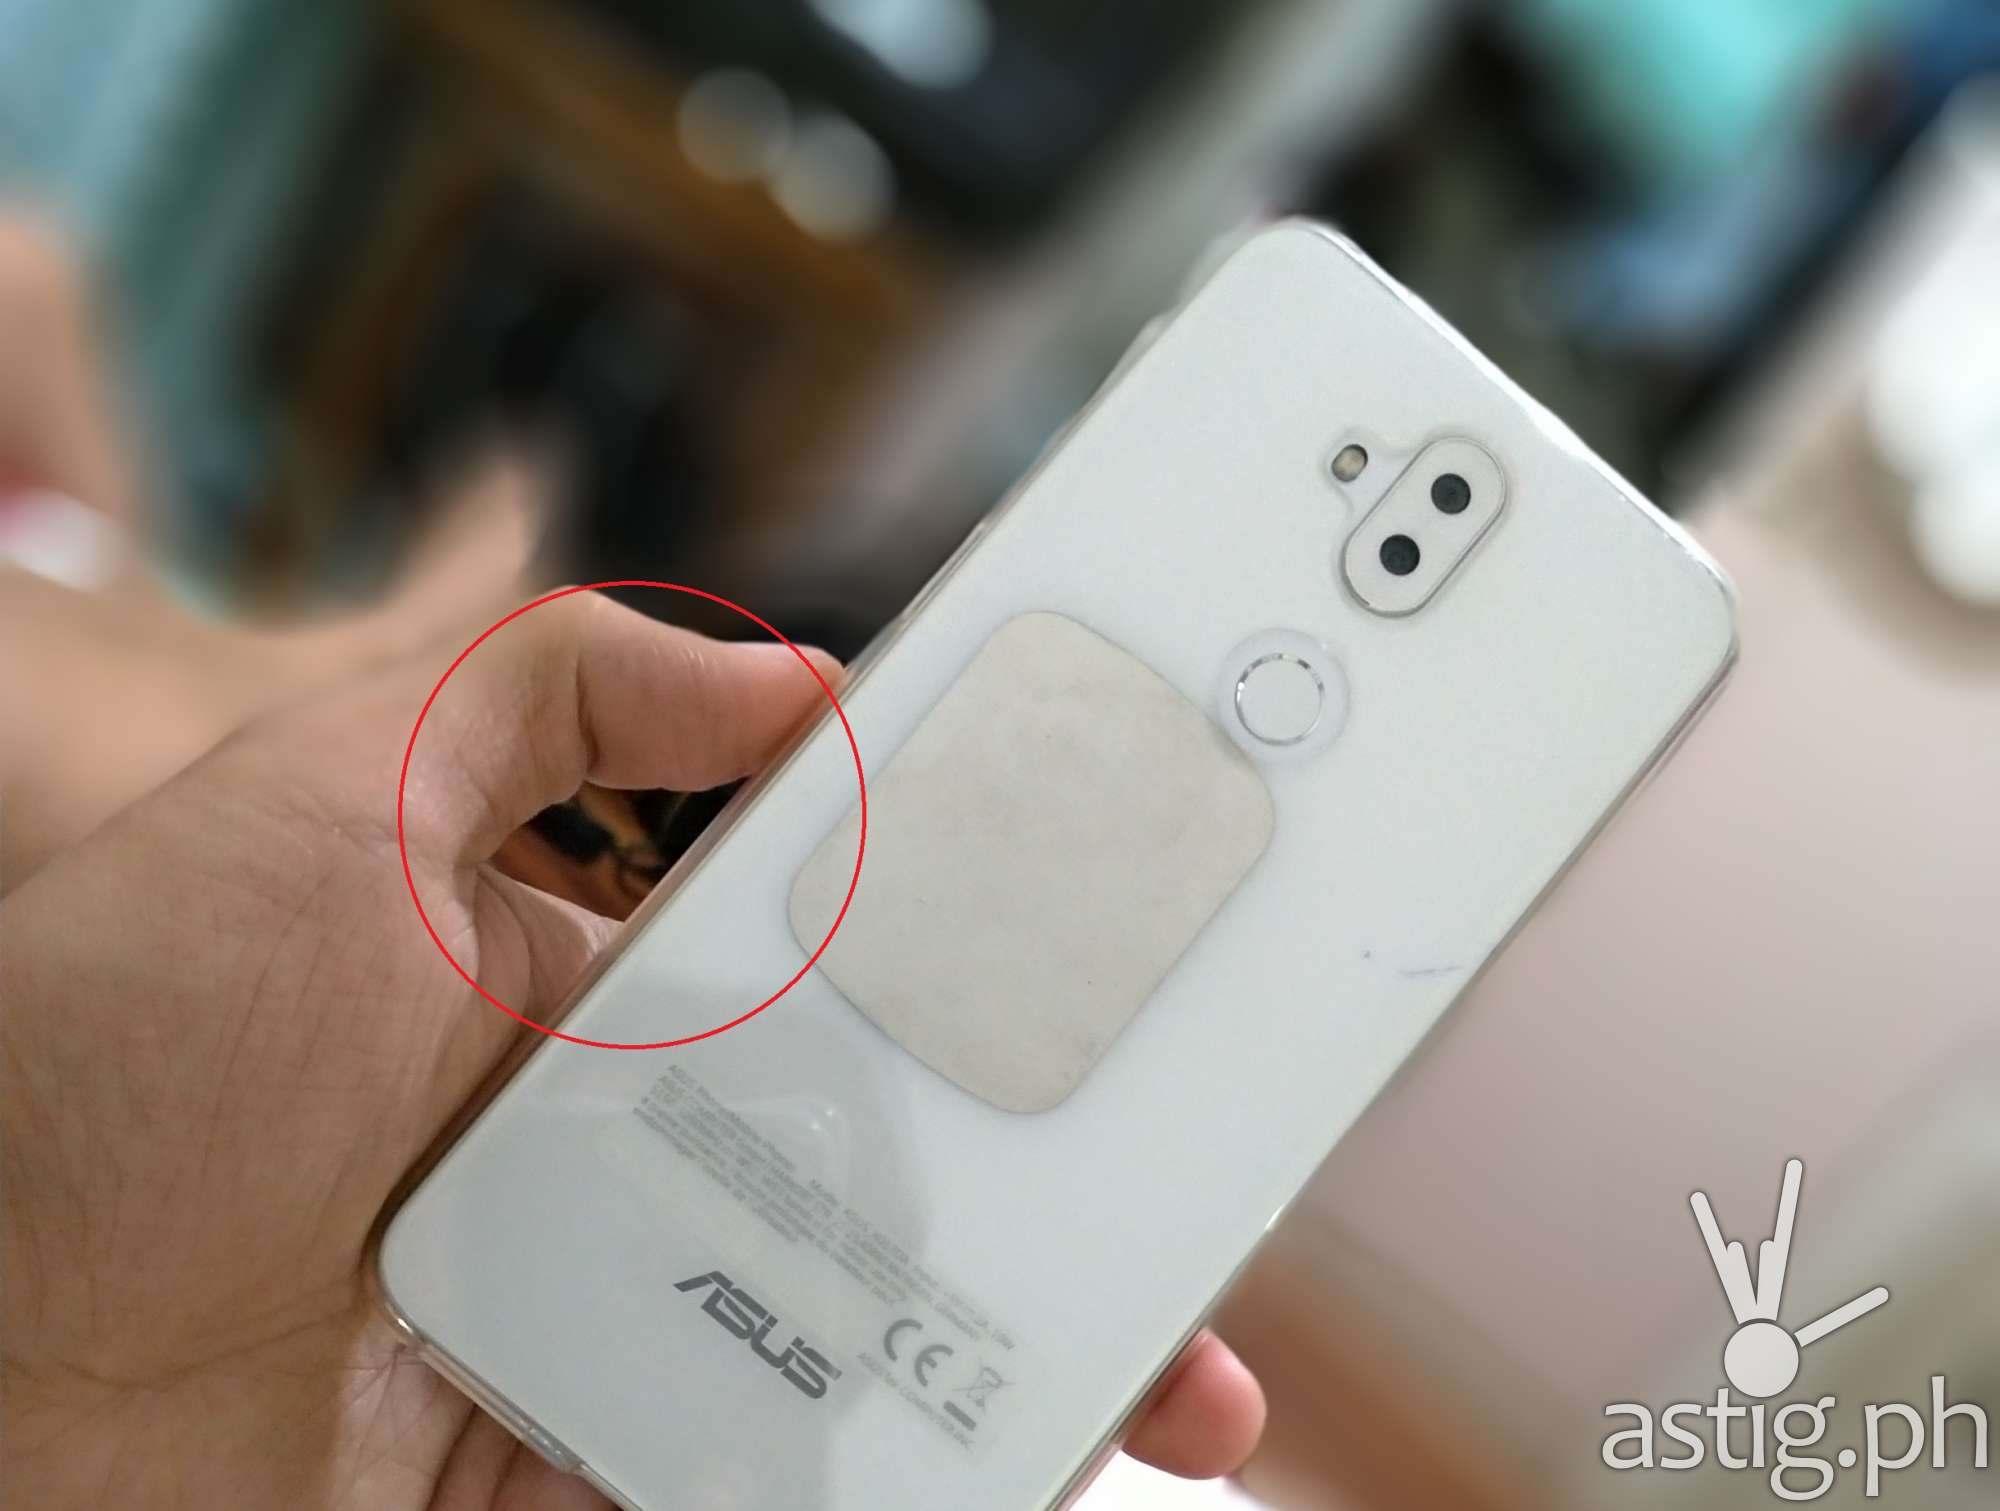 Zenfone 5 sample photo rear camera DOF artifact